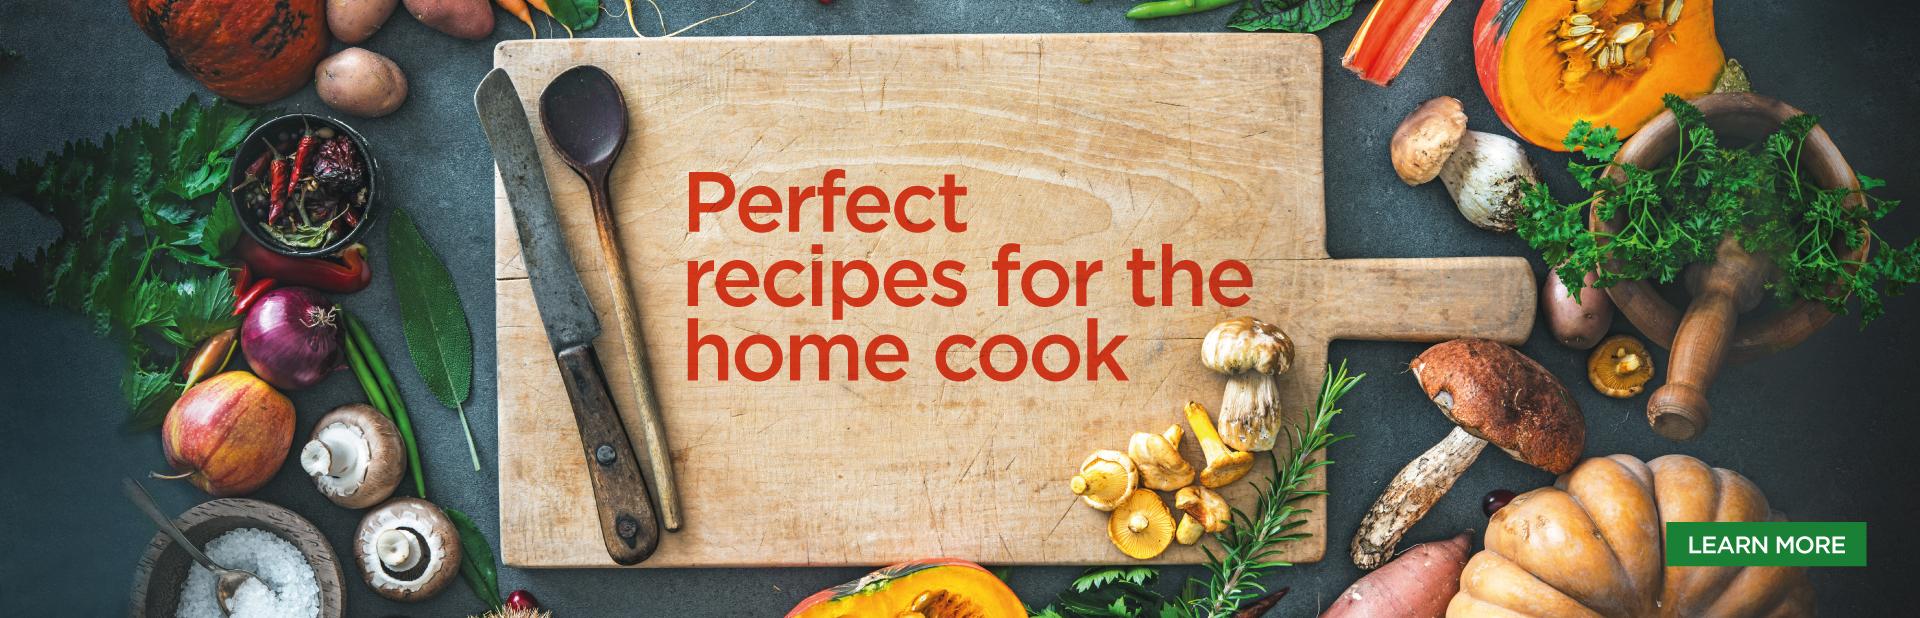 https://www.betterlifeuae.com/recipes